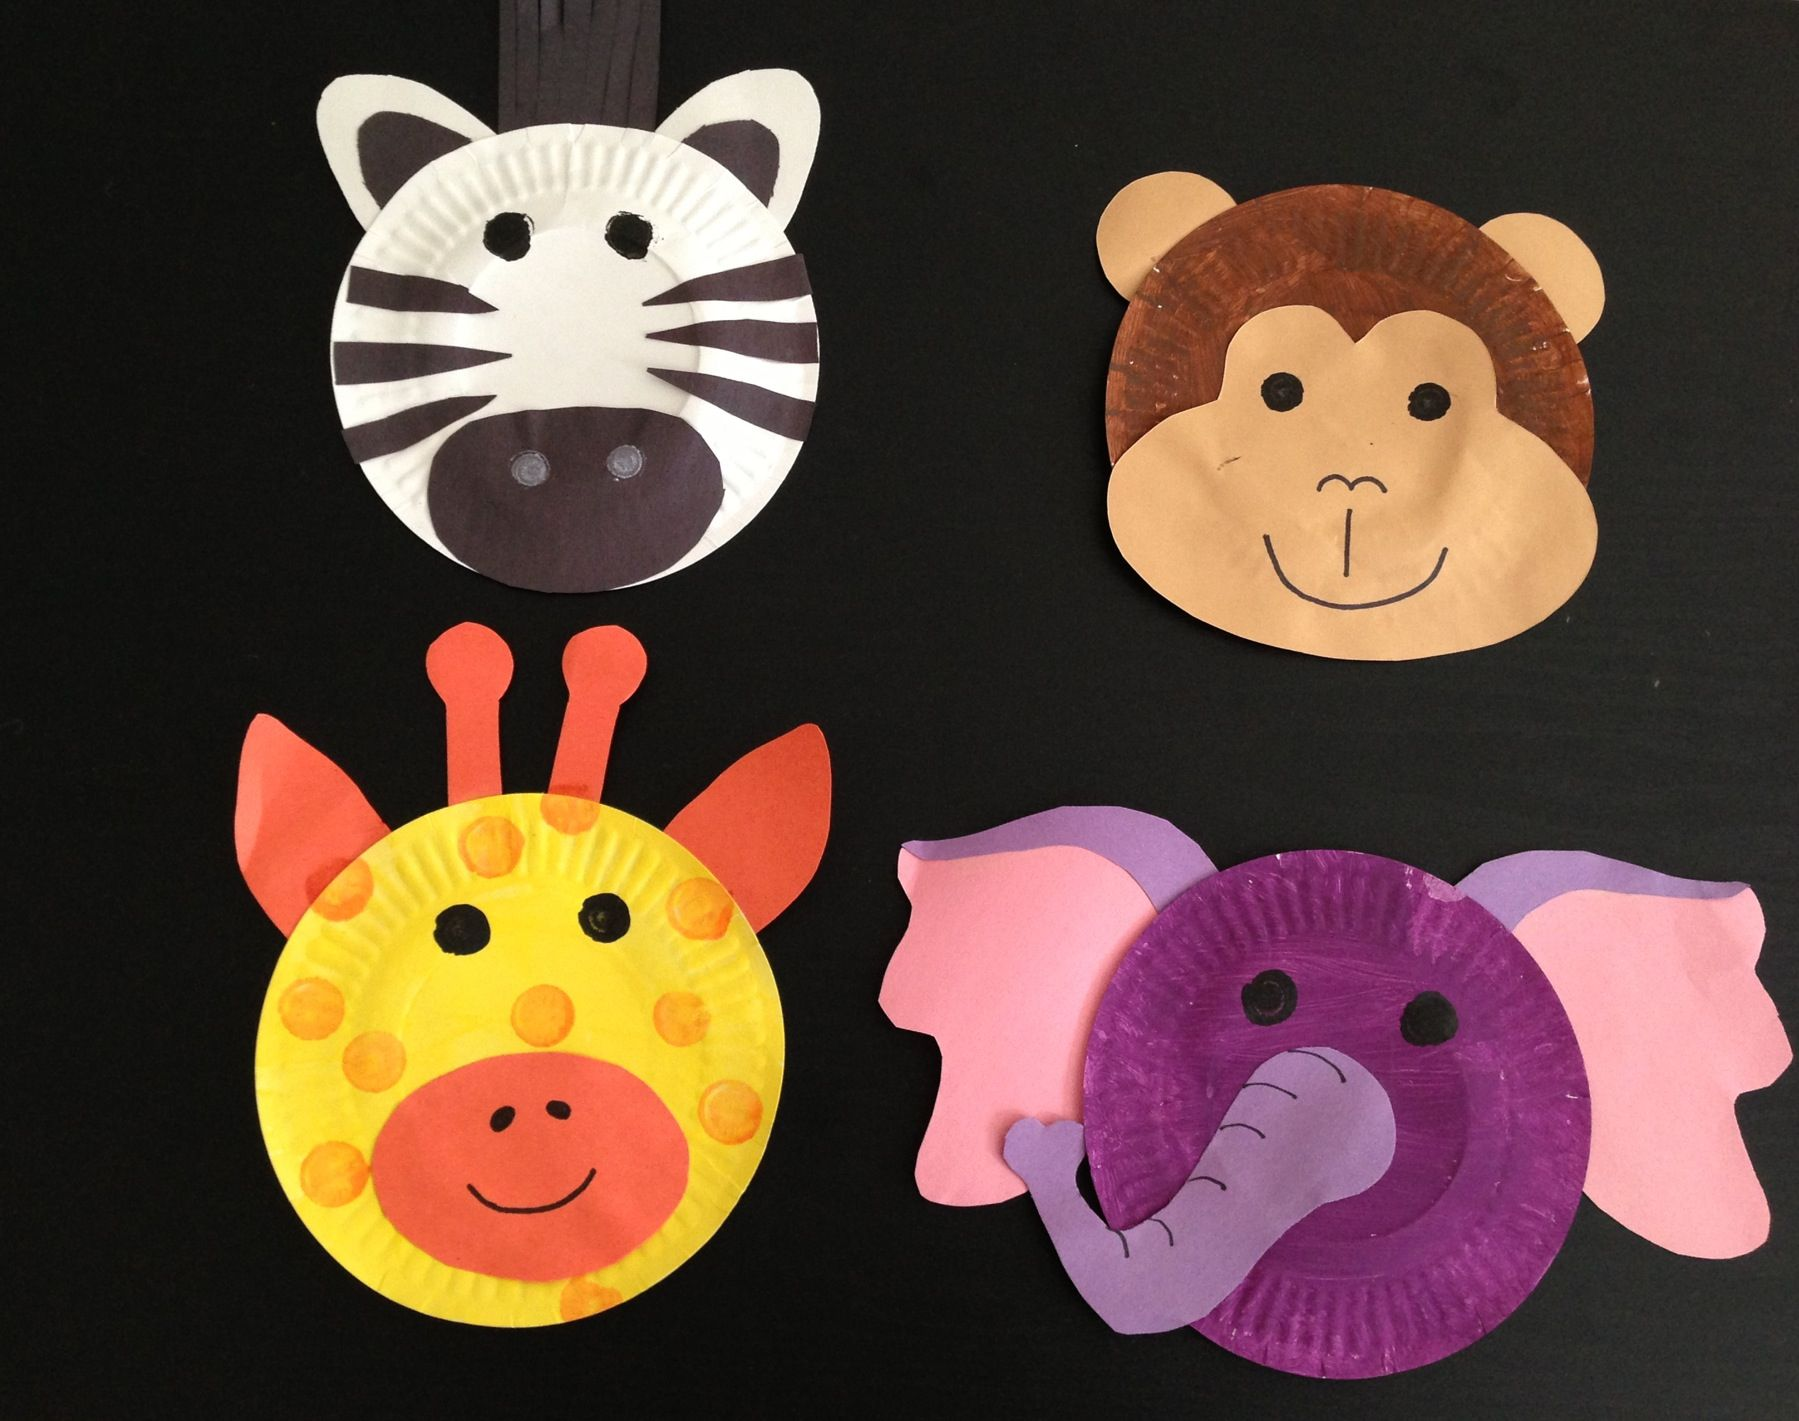 Pin by Rosa Guzman-Eldridge on Pre-K | Safari crafts ...